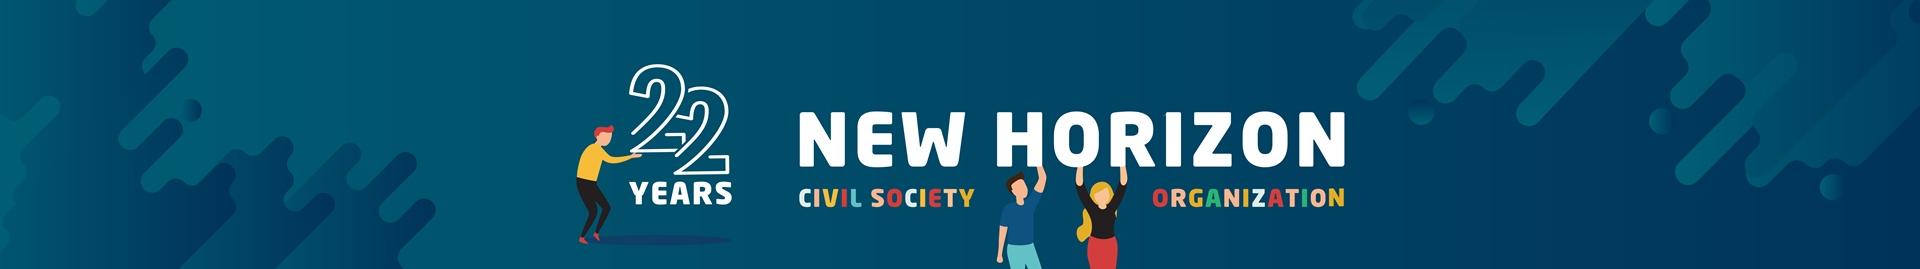 civil society web